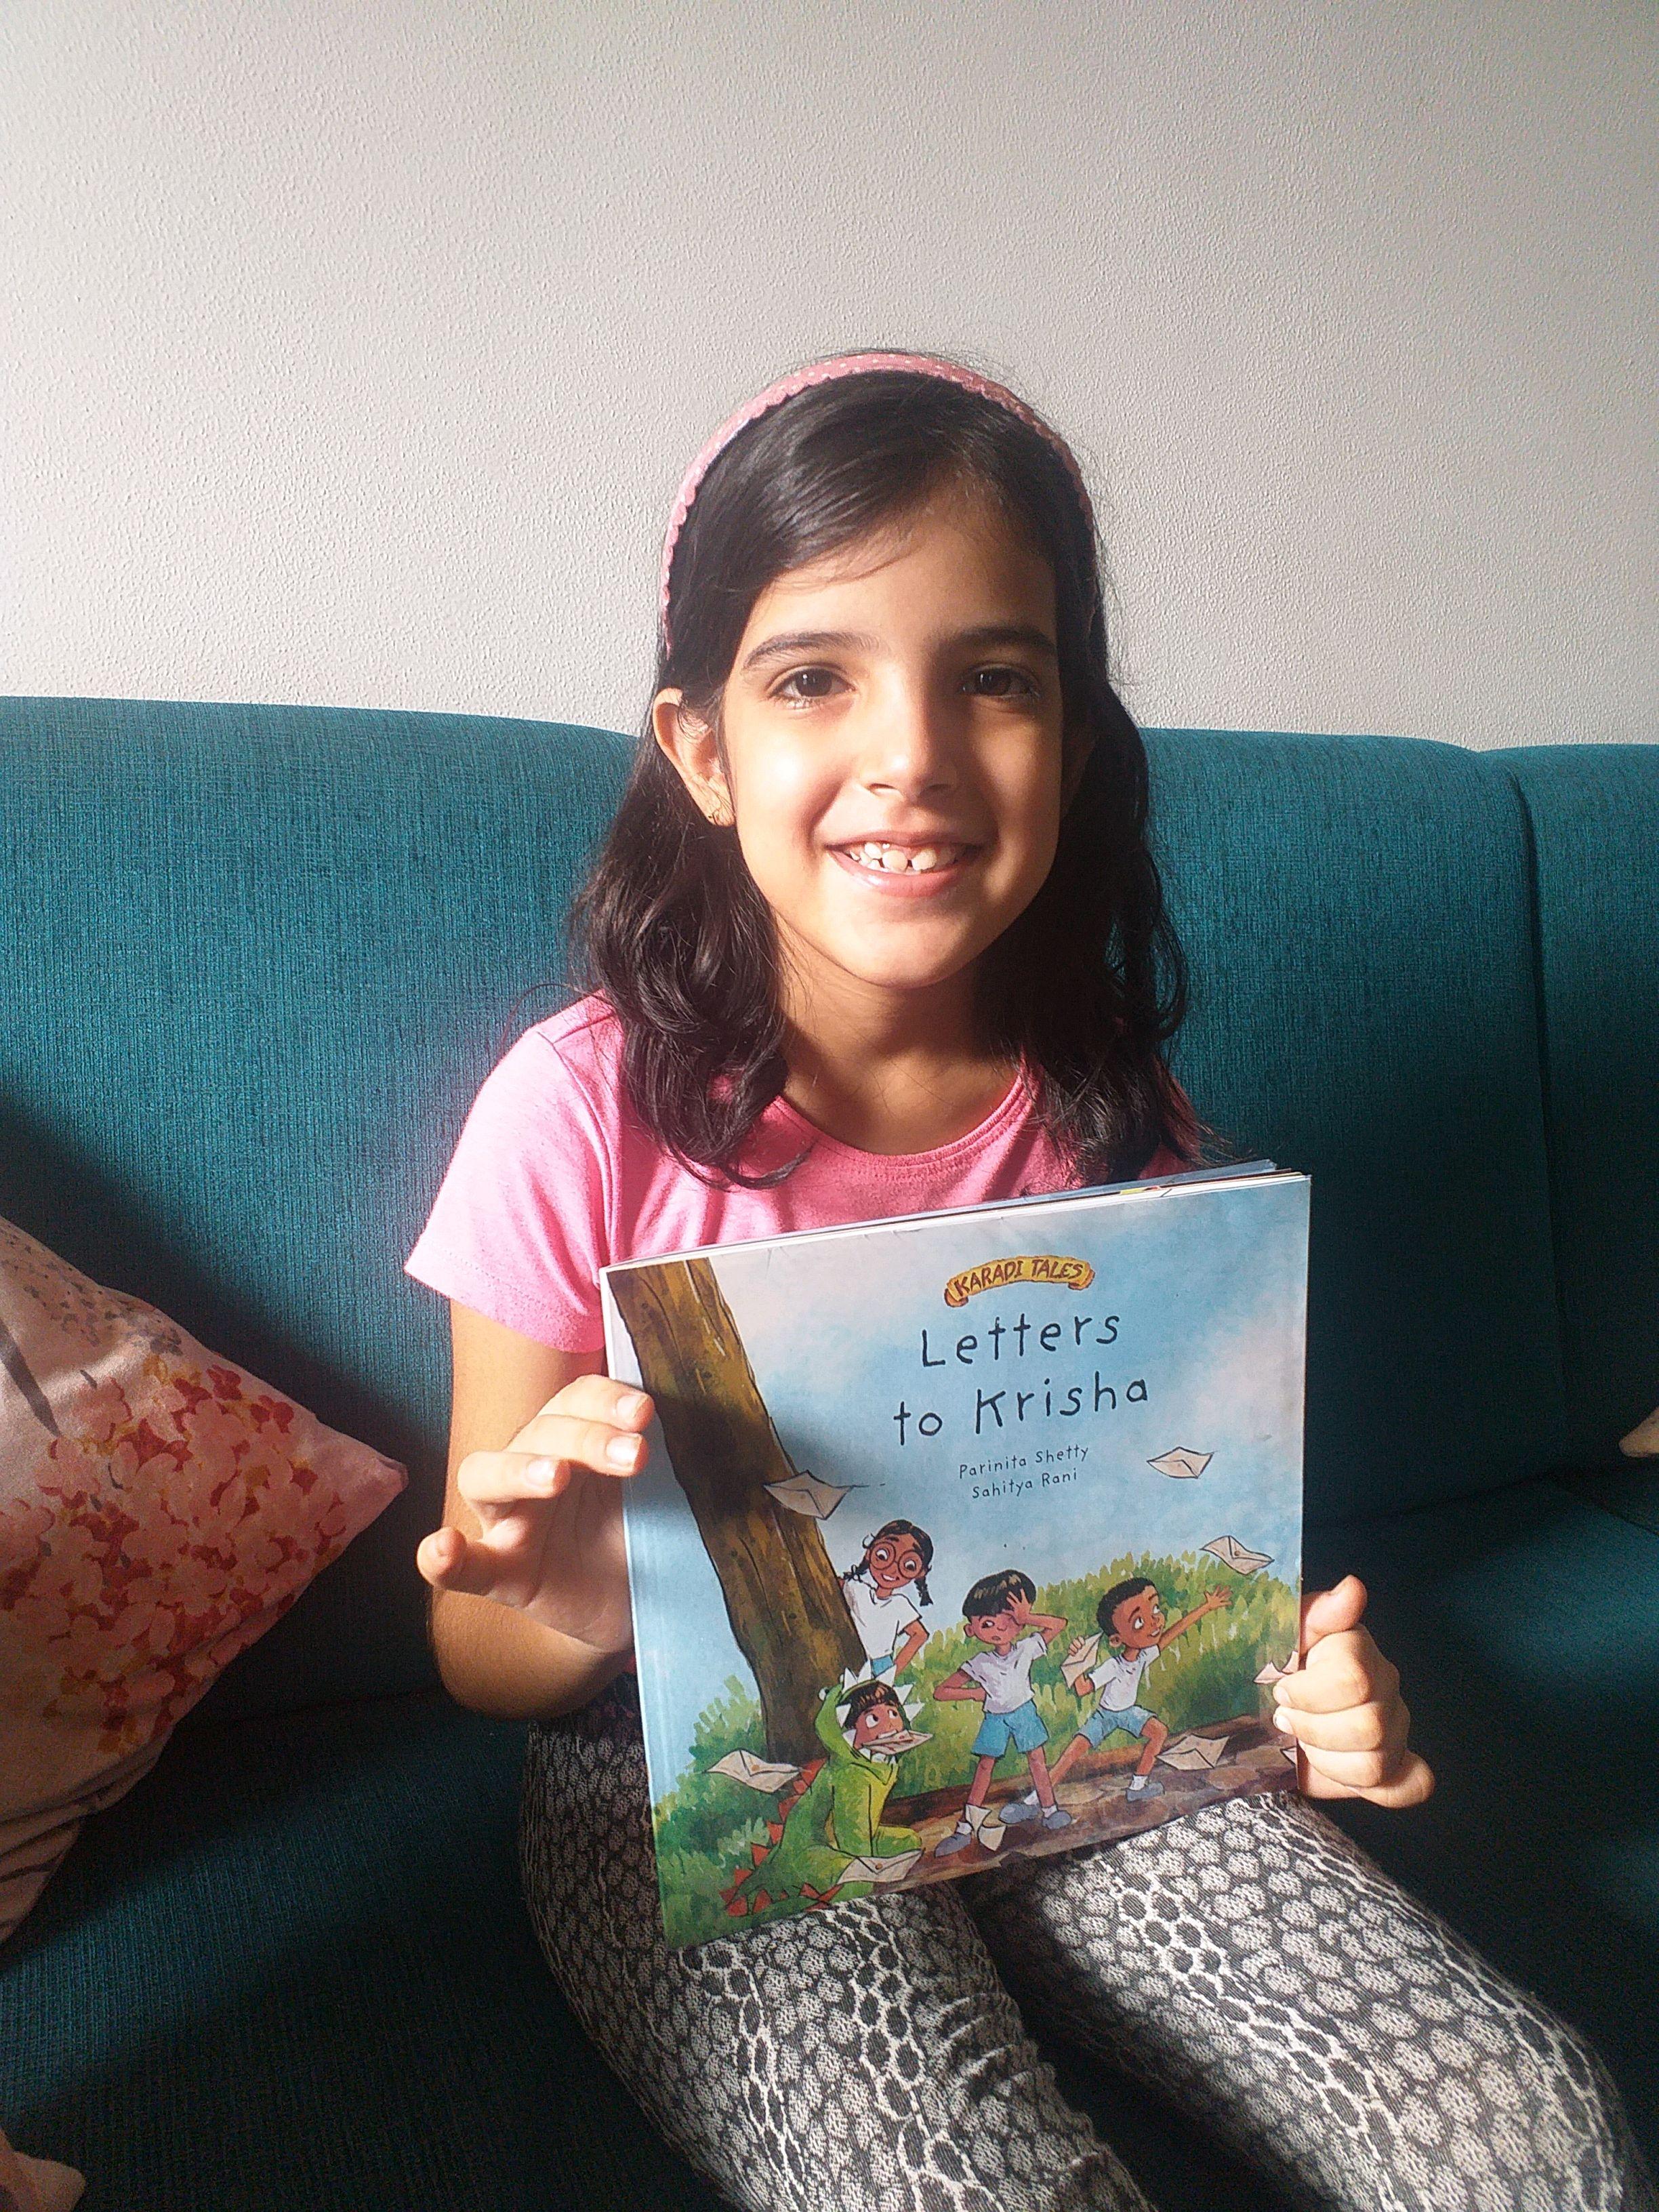 Letters to Krisha, read aloud by Shreeya Tikyani